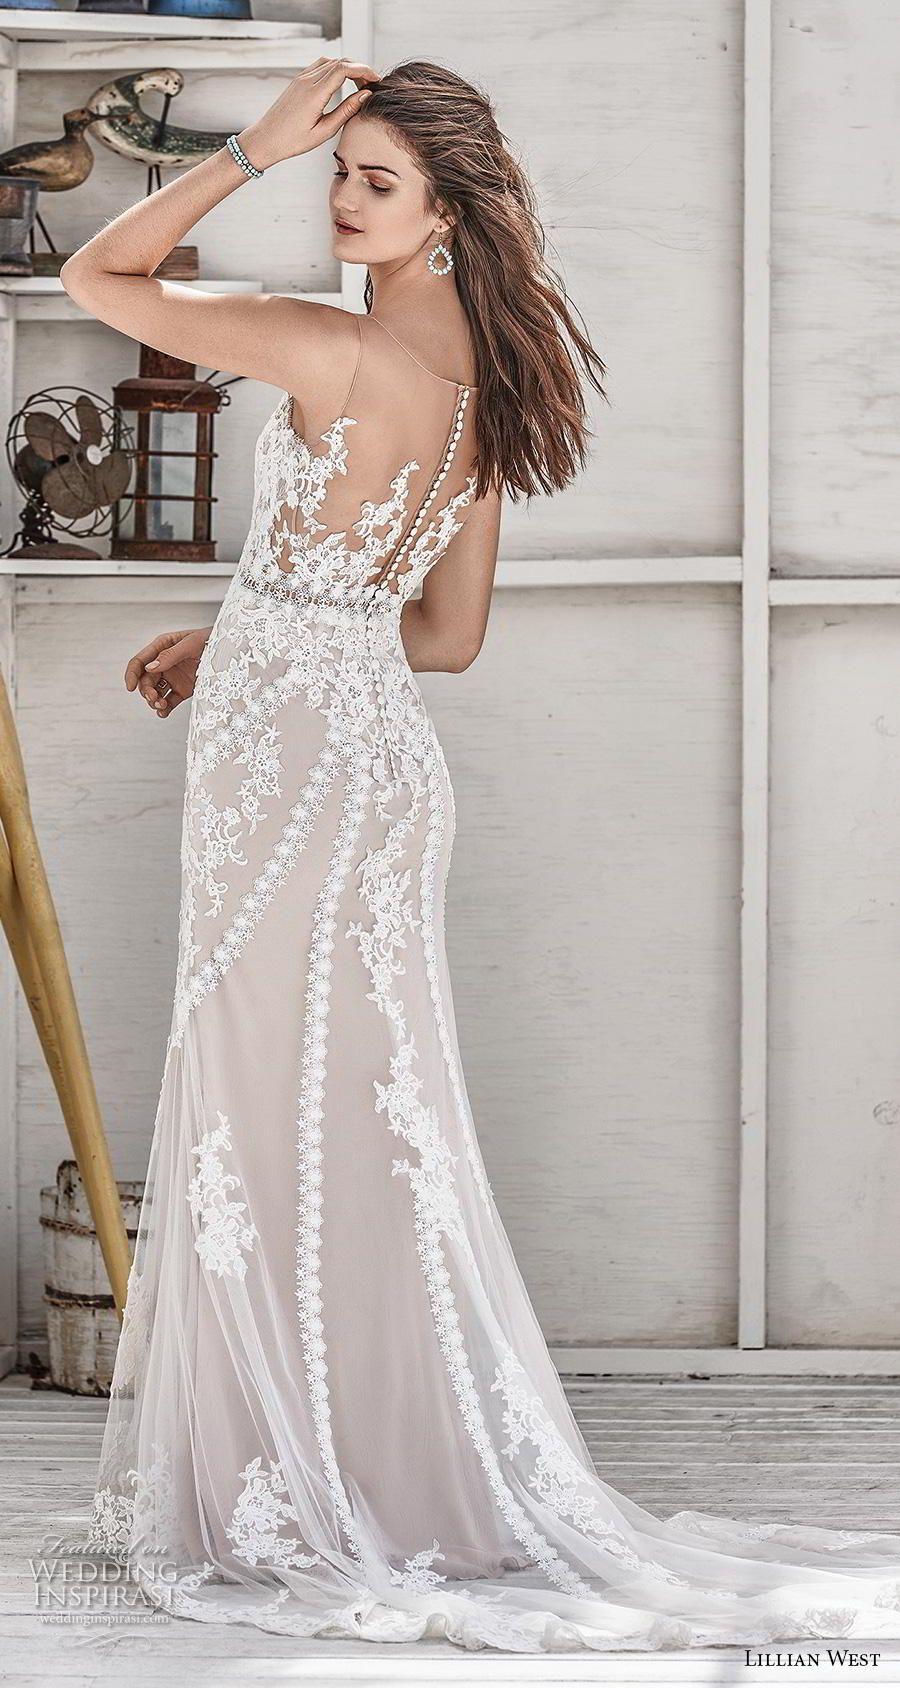 6302824c09 lillian west spring 2019 bridal sleeveless with strap v neck full  embellishment elegant blush fit and flare sheath wedding dress sheer button  back medium ...